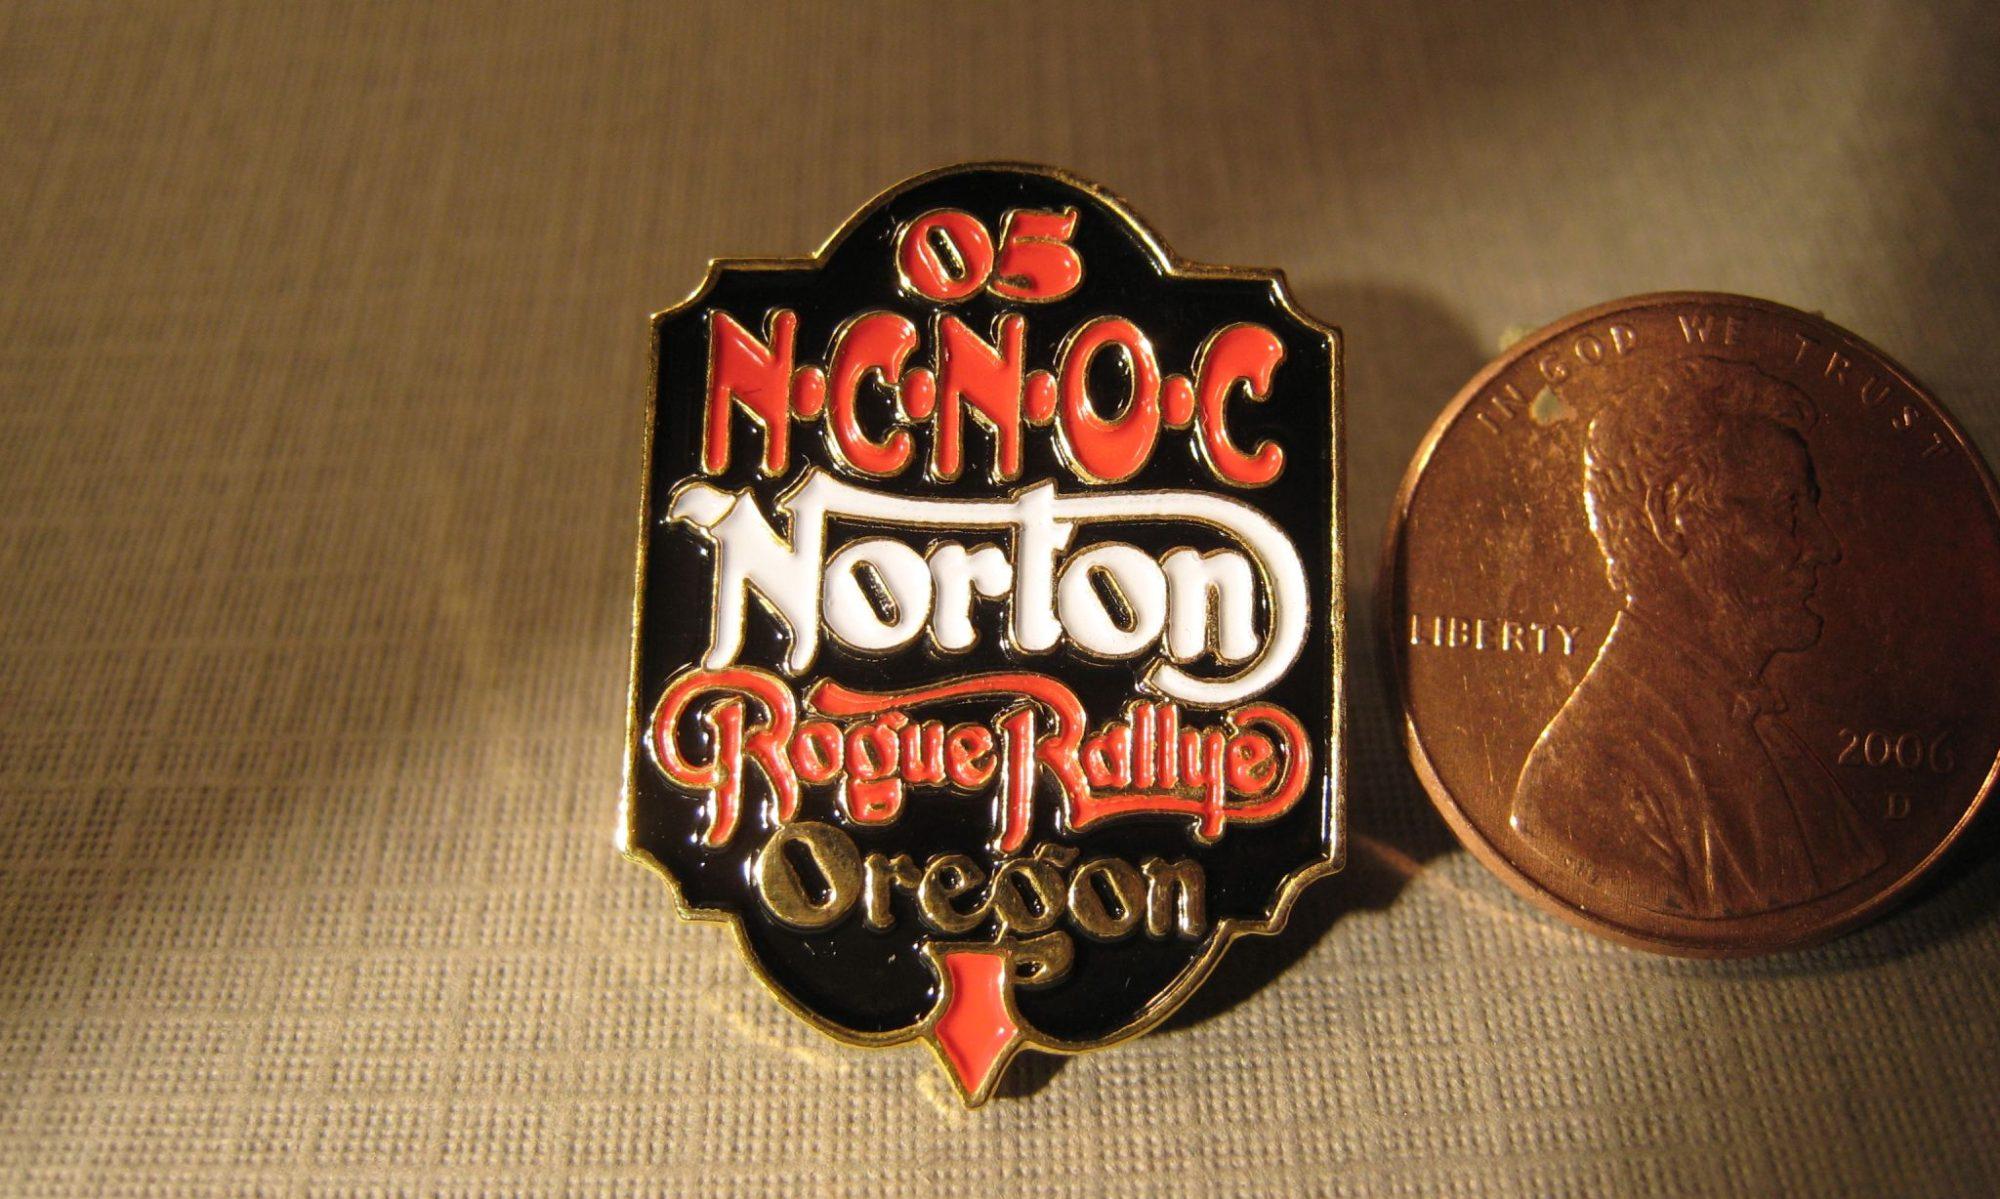 NCNOC